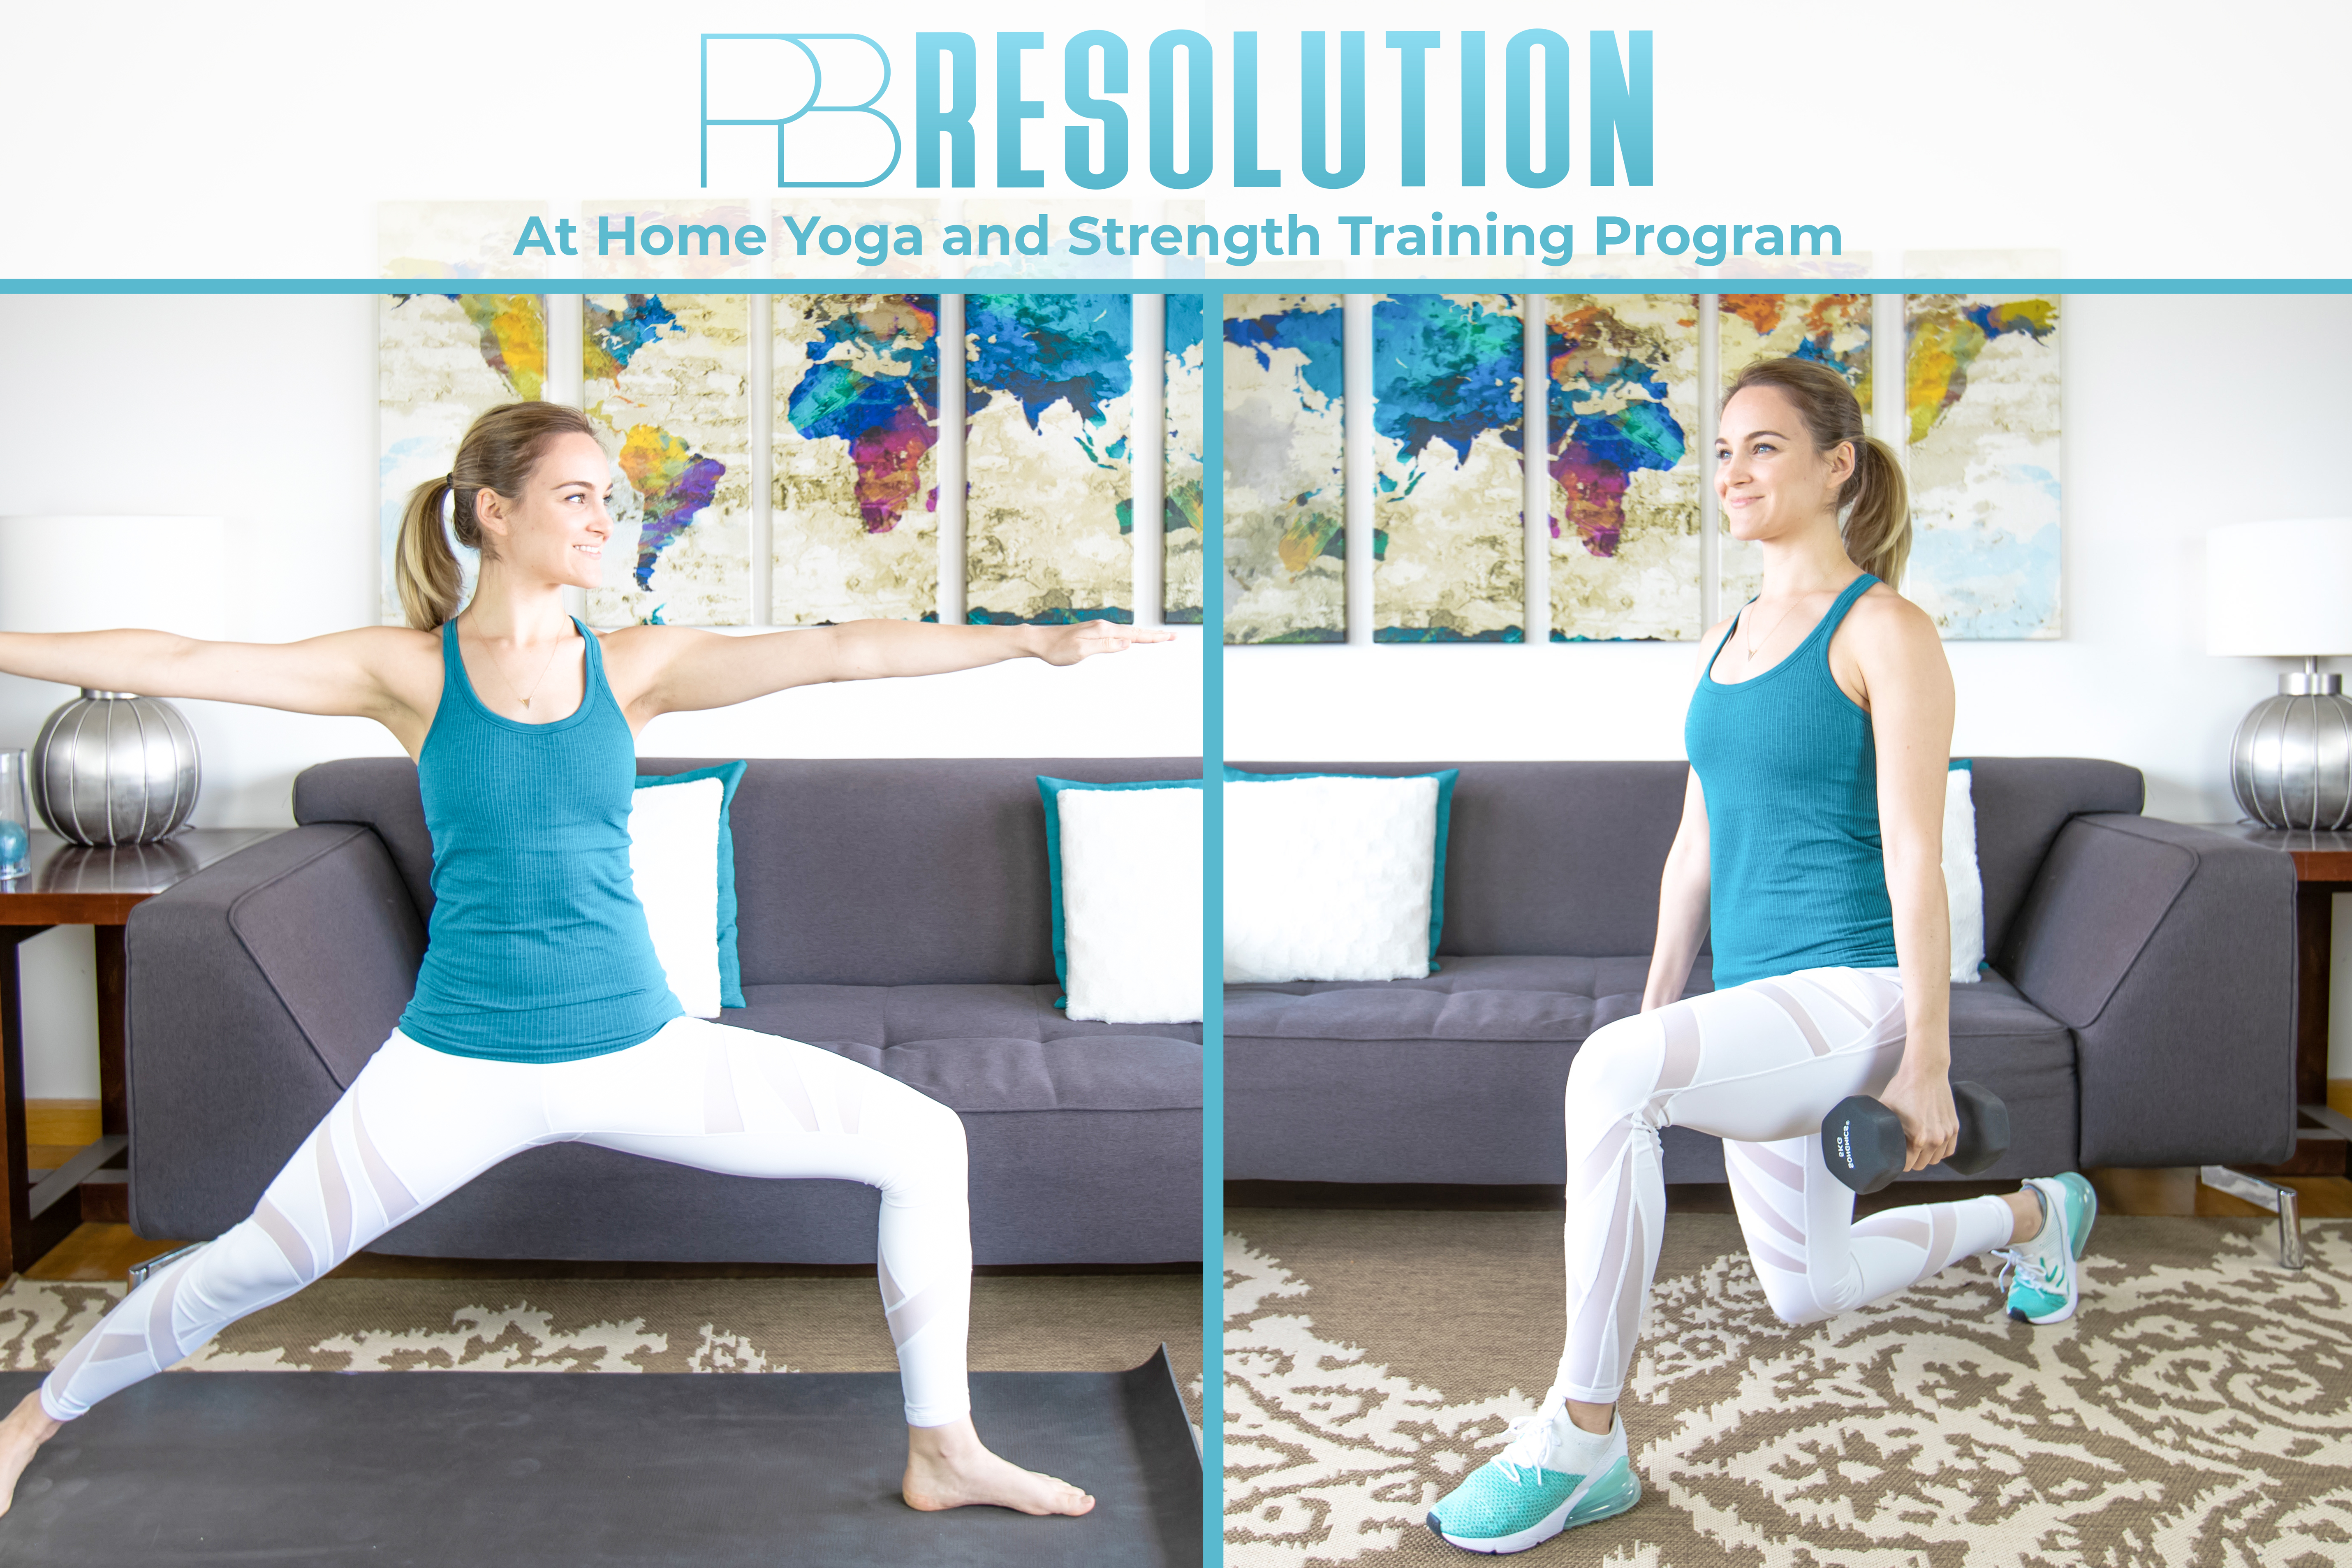 Bad Yogi Launches Digital Yoga And Strength Training Program Pb